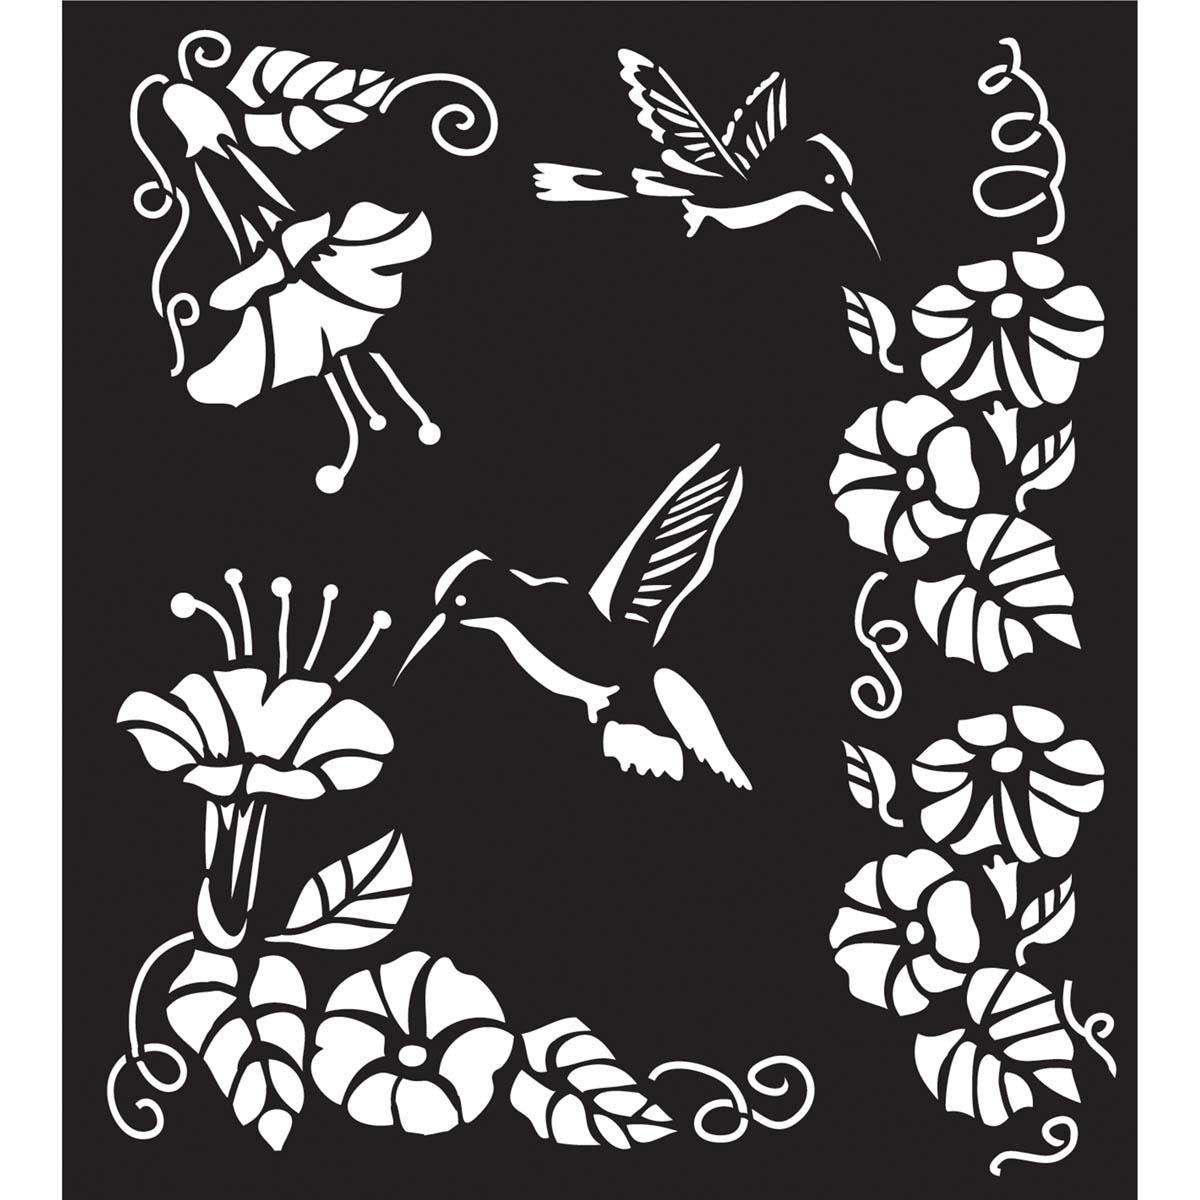 FolkArt ® Painting Stencils - Large - Hummingbird